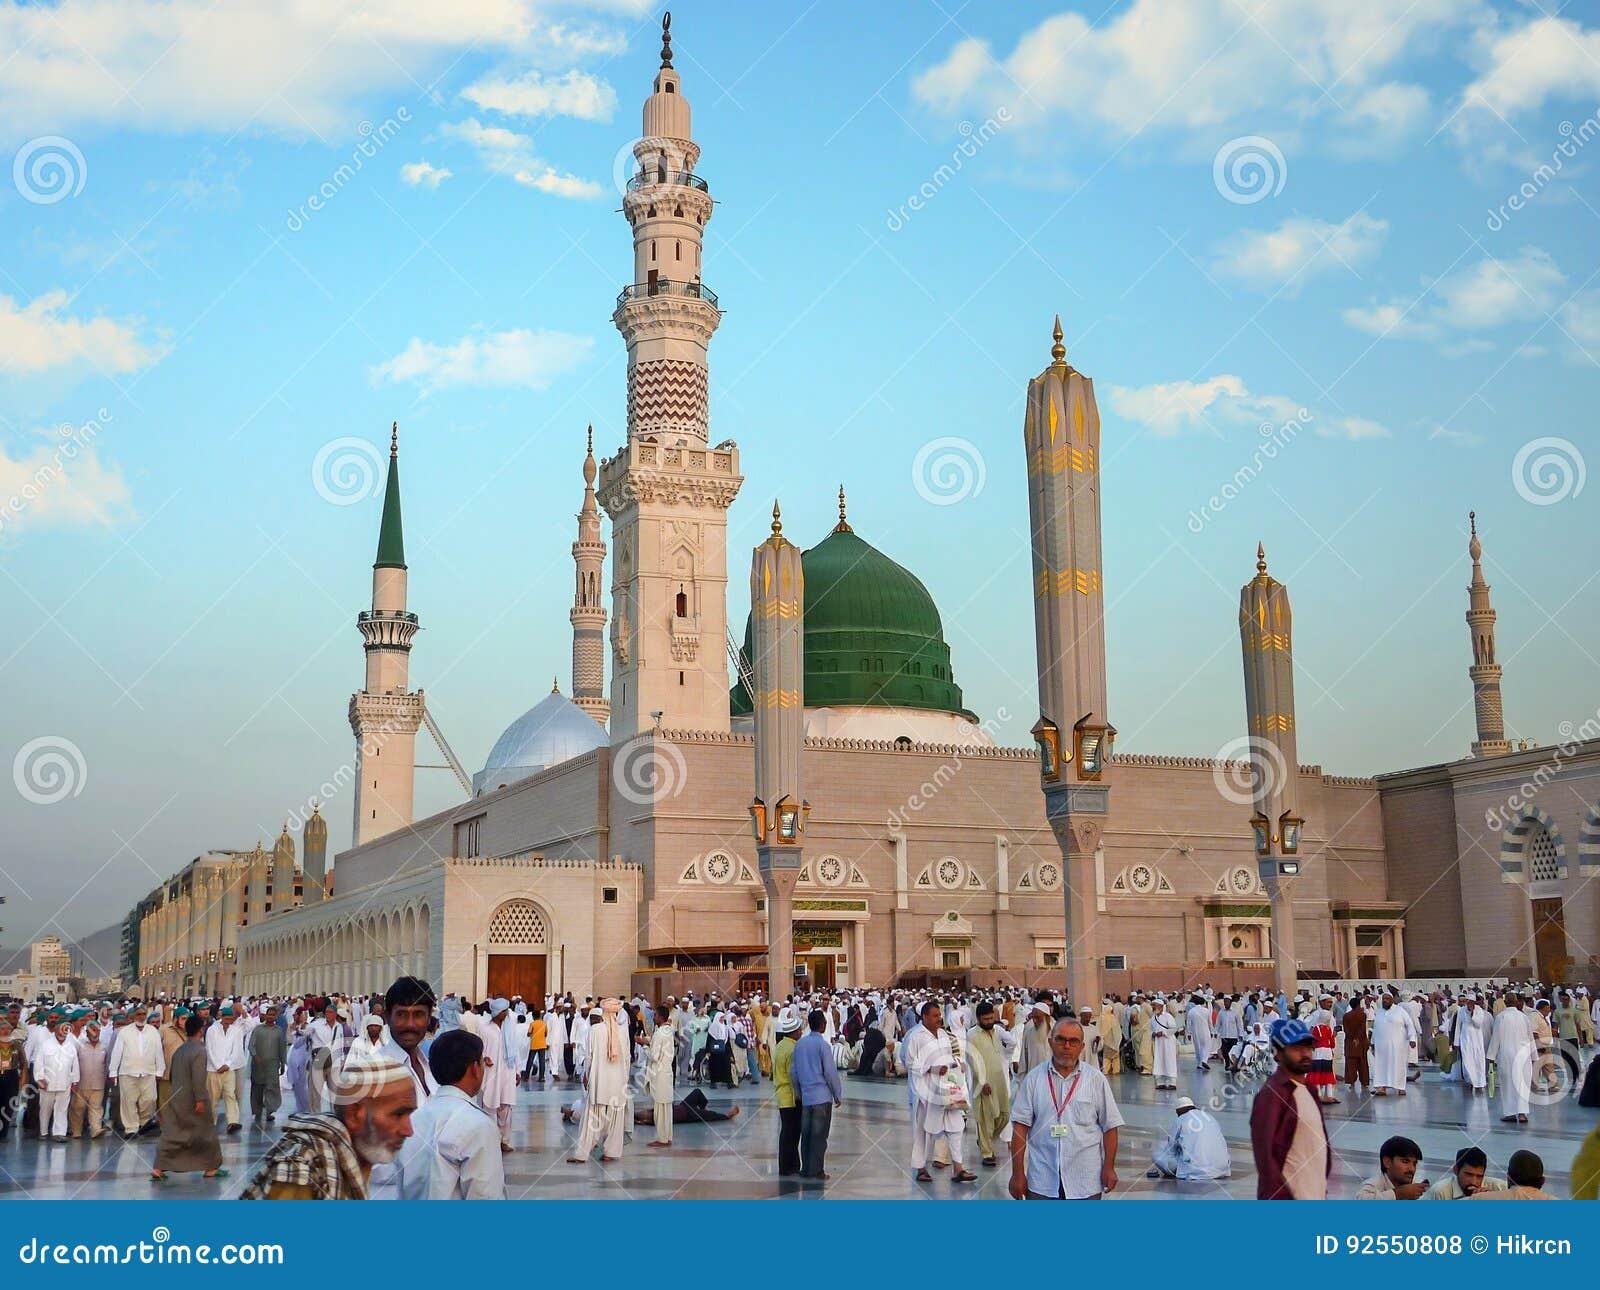 nabawi mosque medina saudi arabia editorial stock photo image of